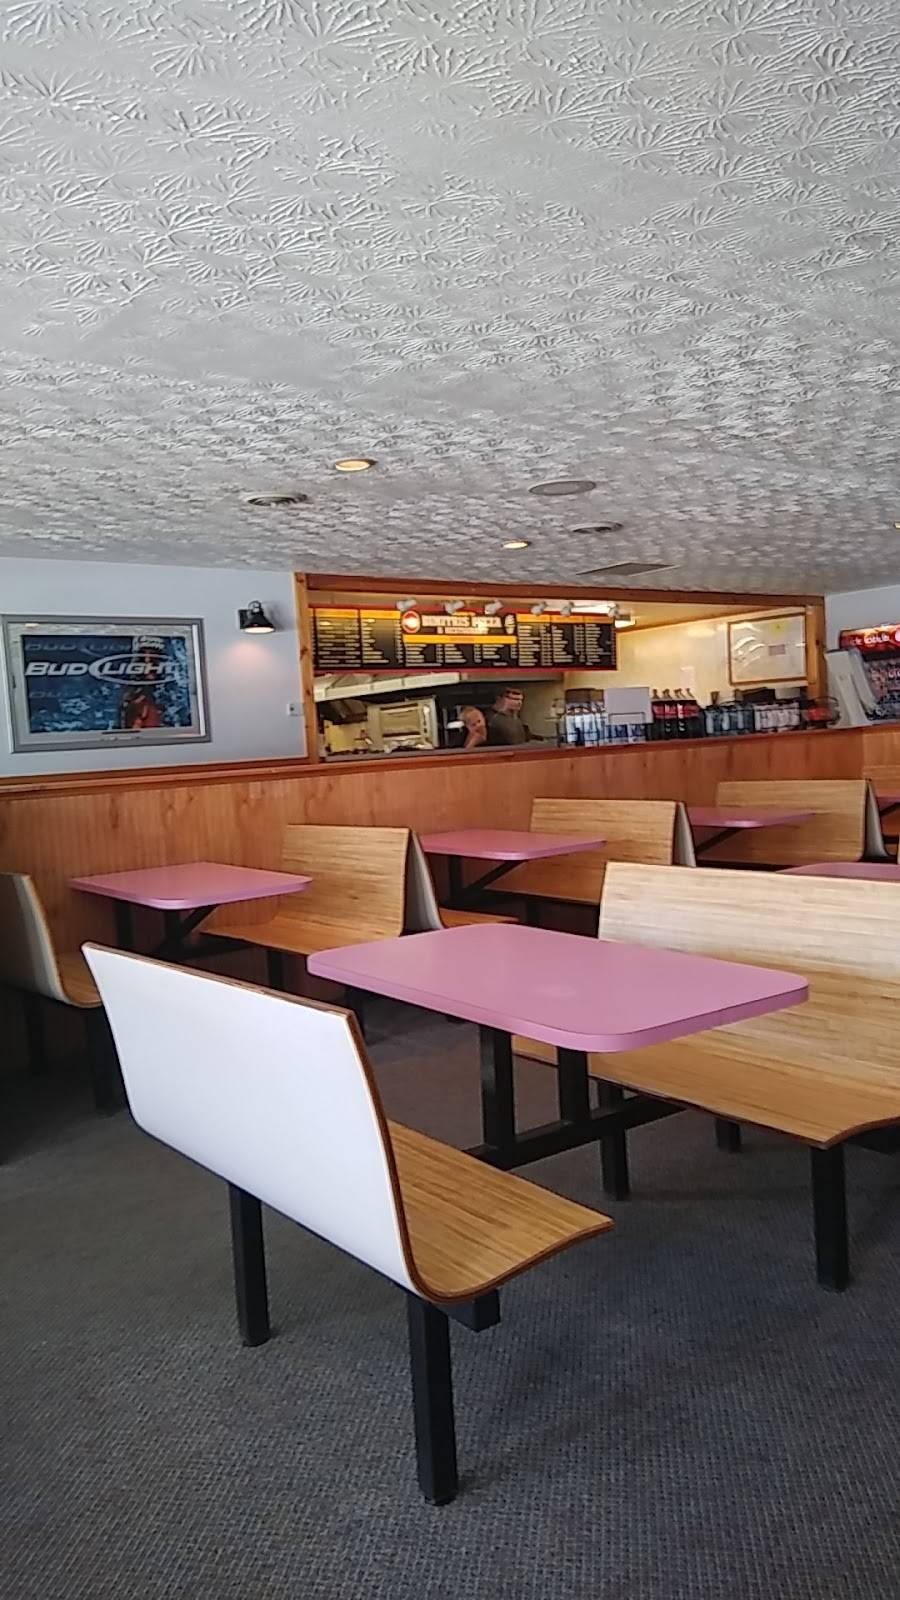 Dimitris Pizza & Restaurant | restaurant | 1111 S Stark Hwy # 1, Weare, NH 03281, USA | 6035294300 OR +1 603-529-4300